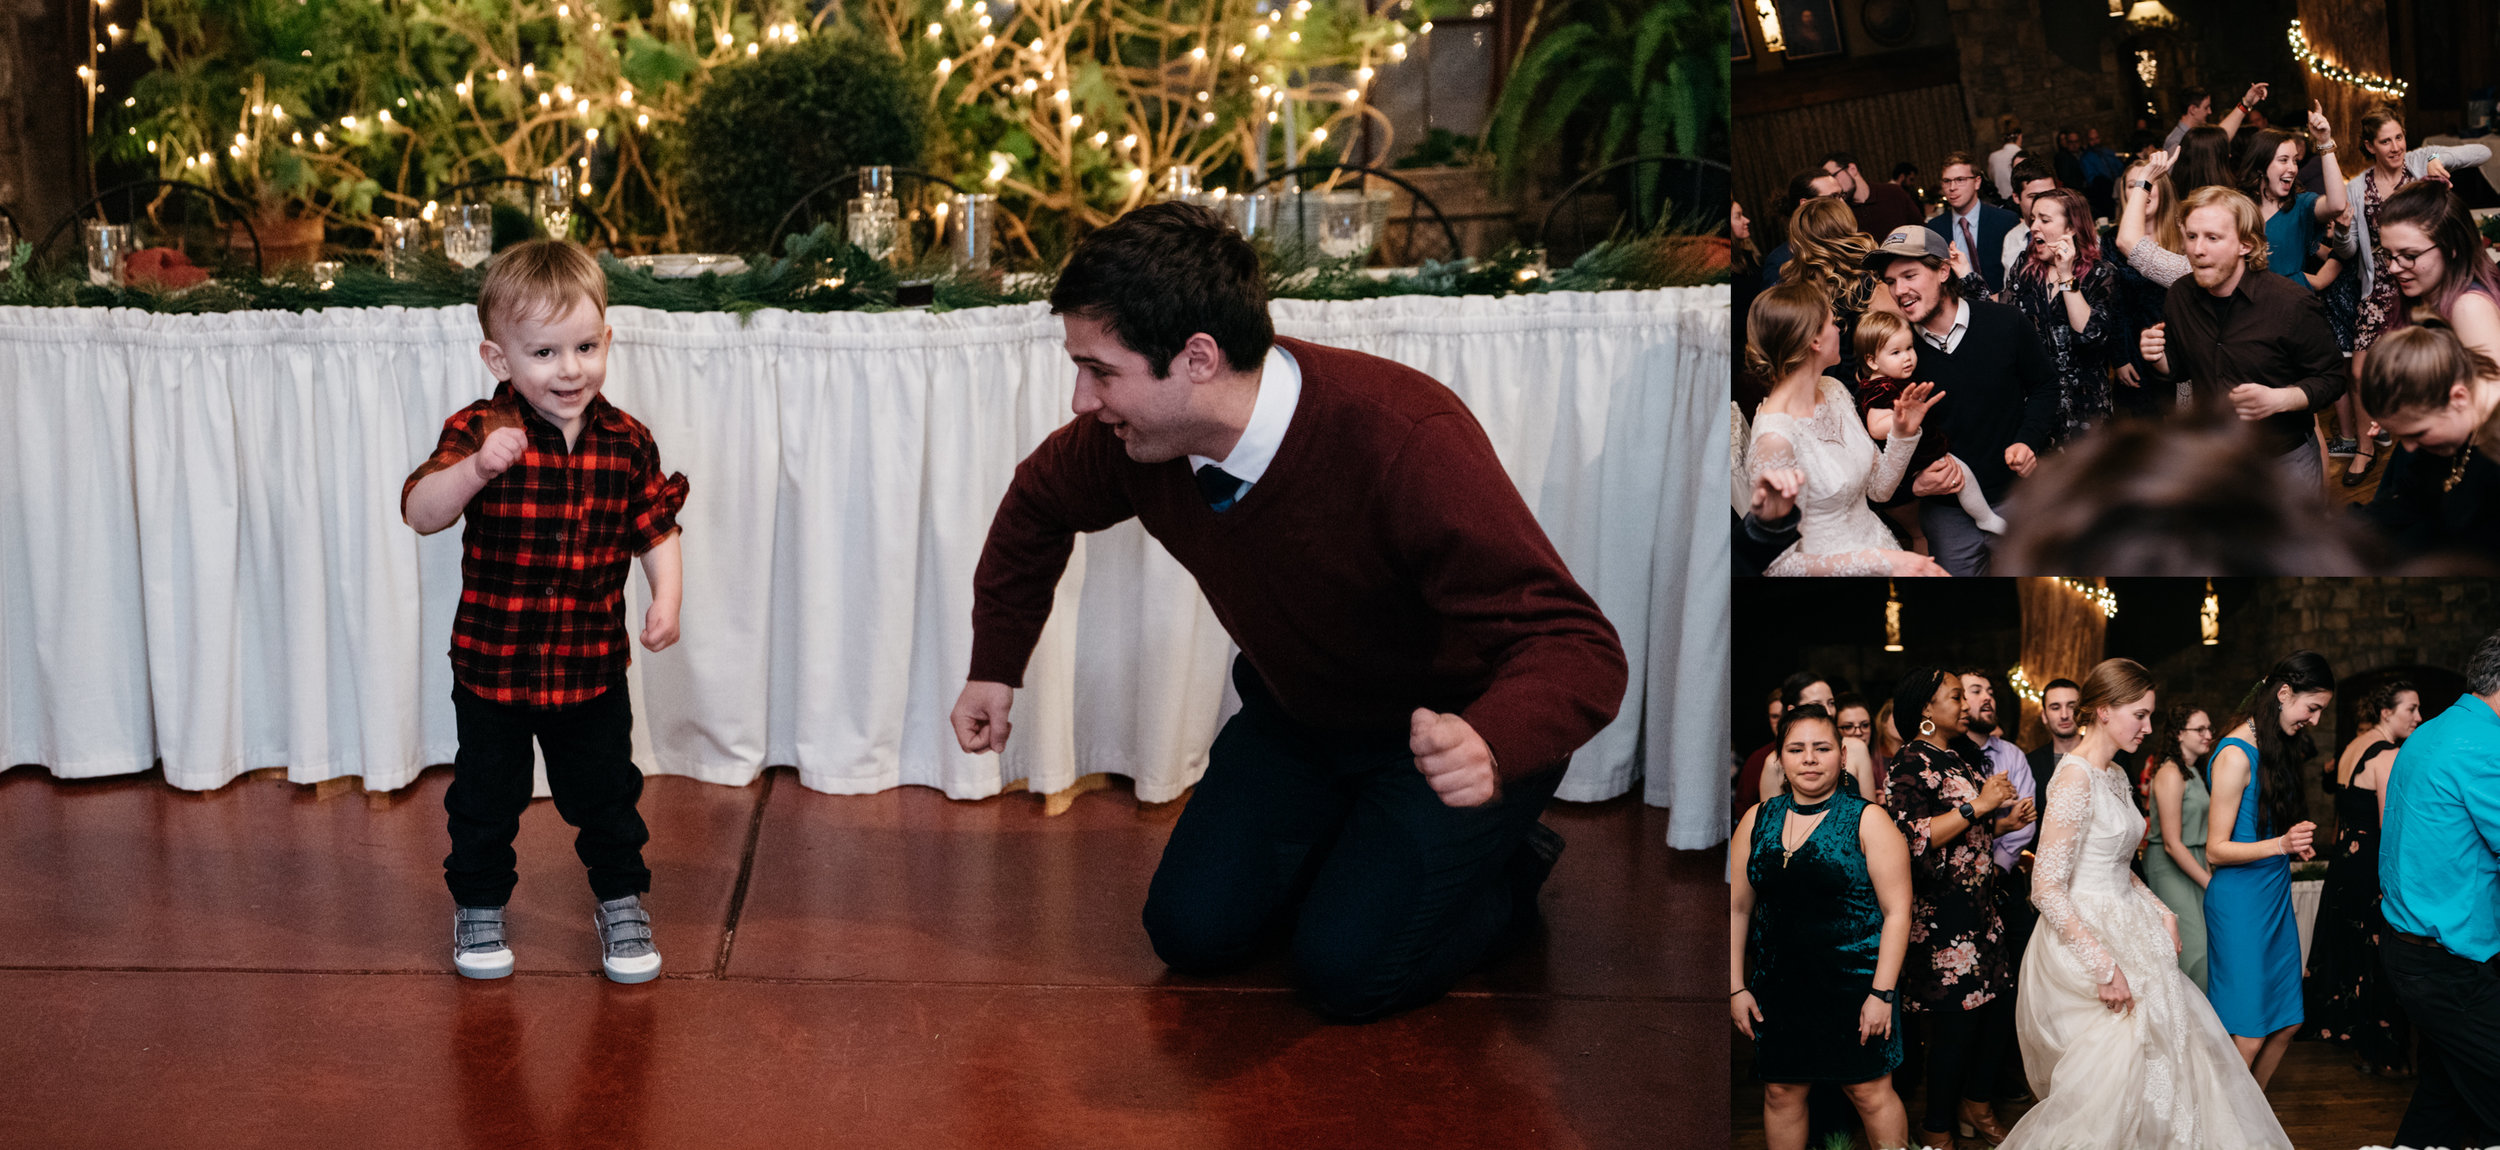 Green Gables wedding reception, mariah fisher photography.jpg